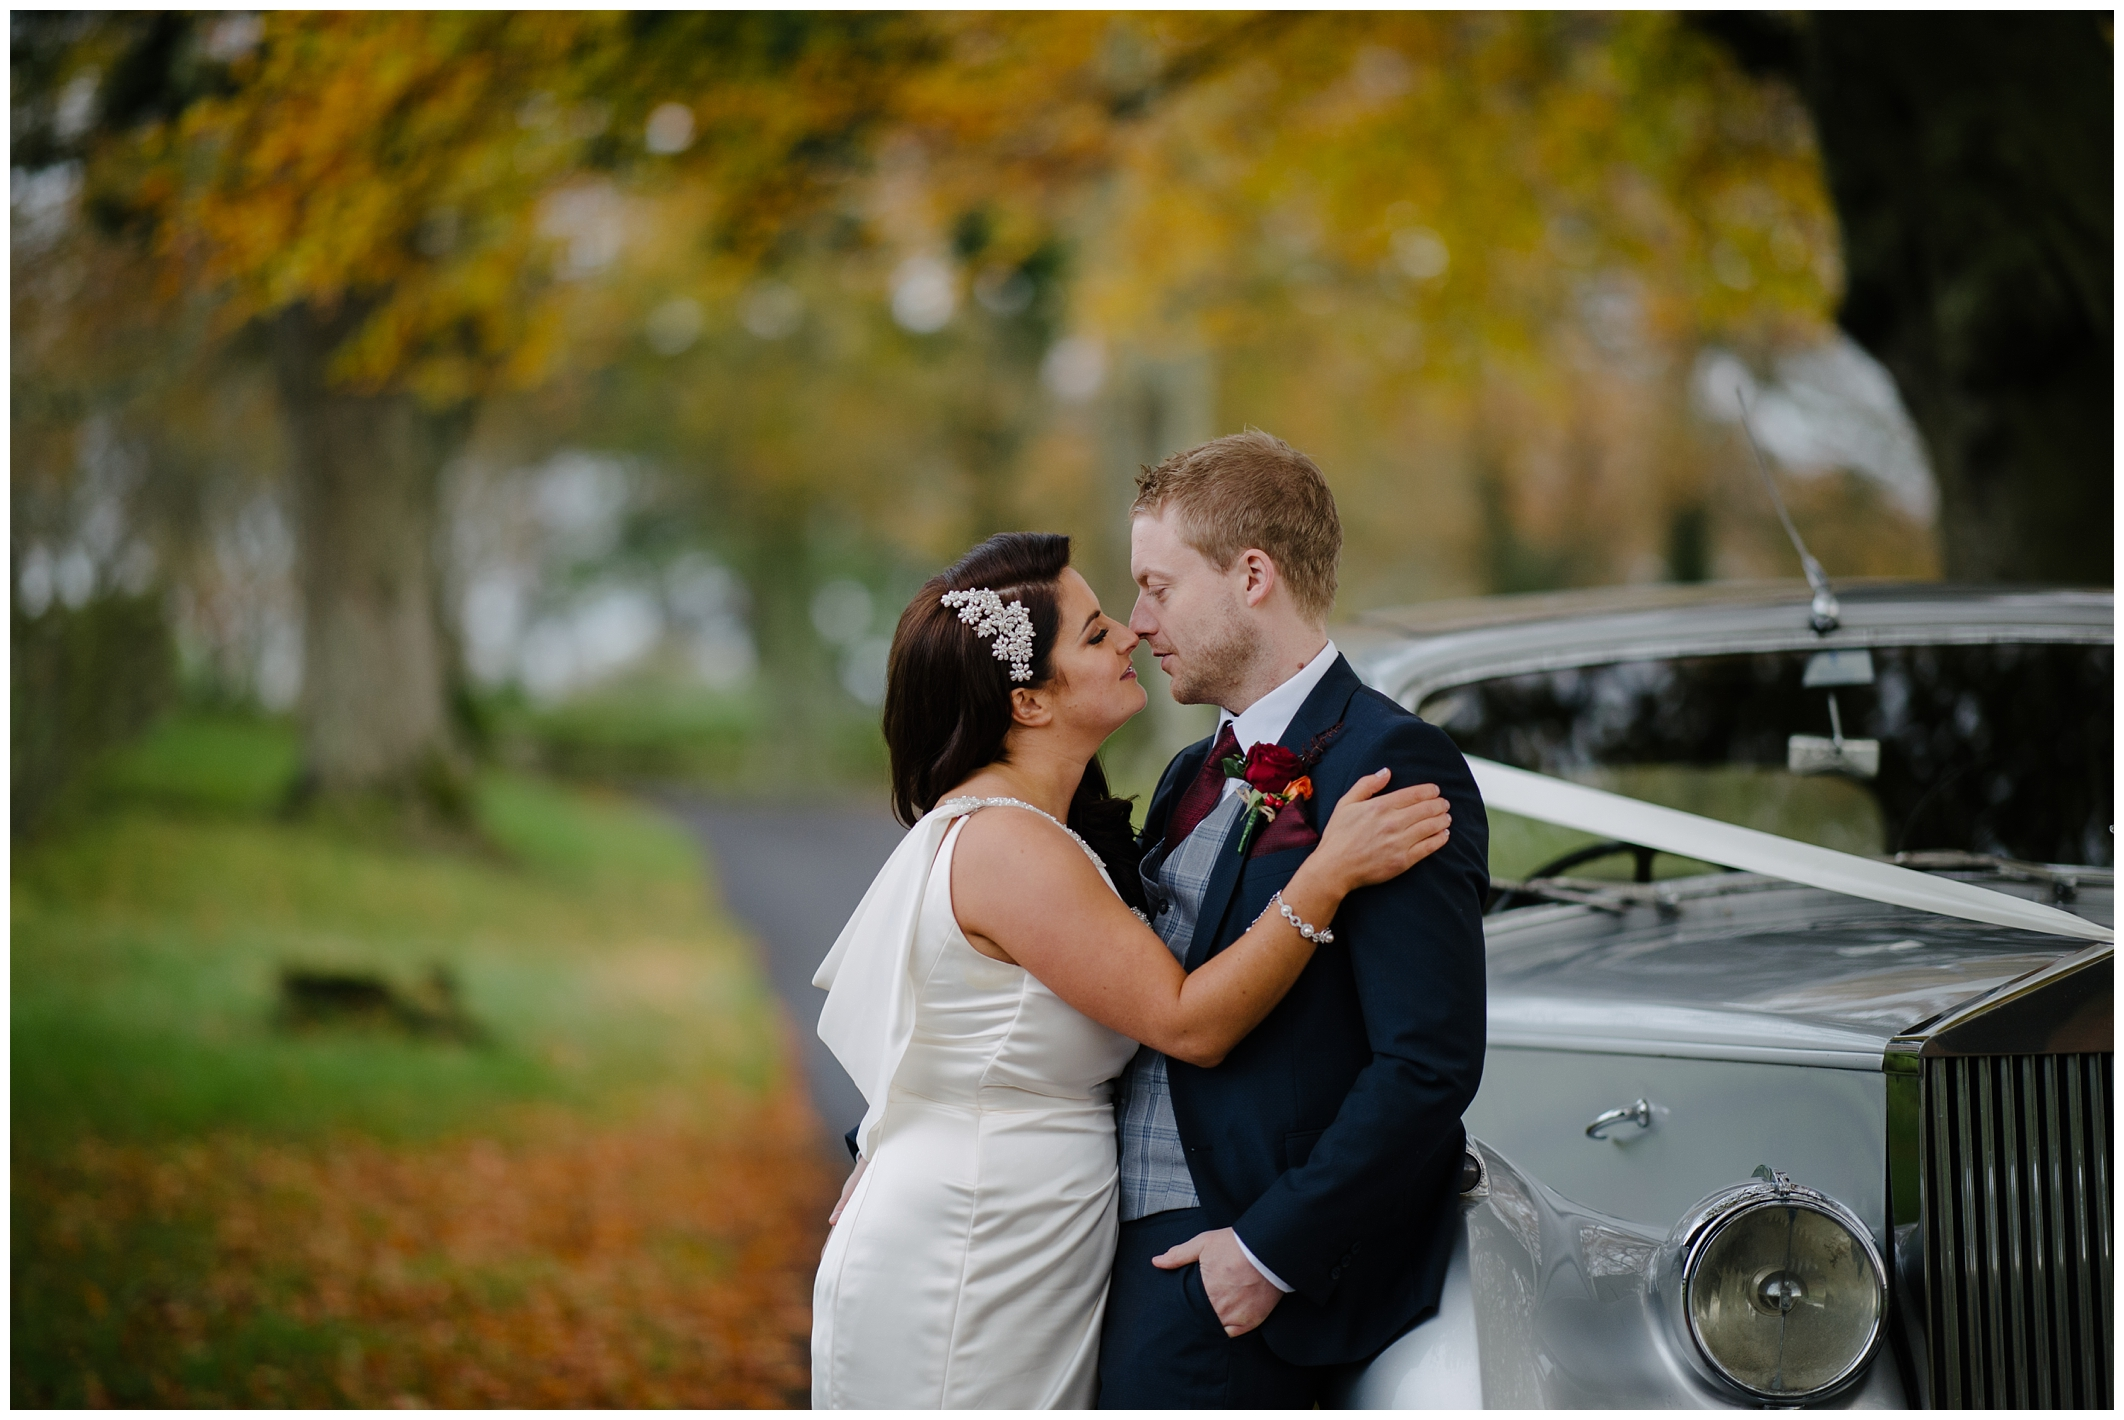 tracey_conor__wedding_jude_browne_photography_0070.jpg